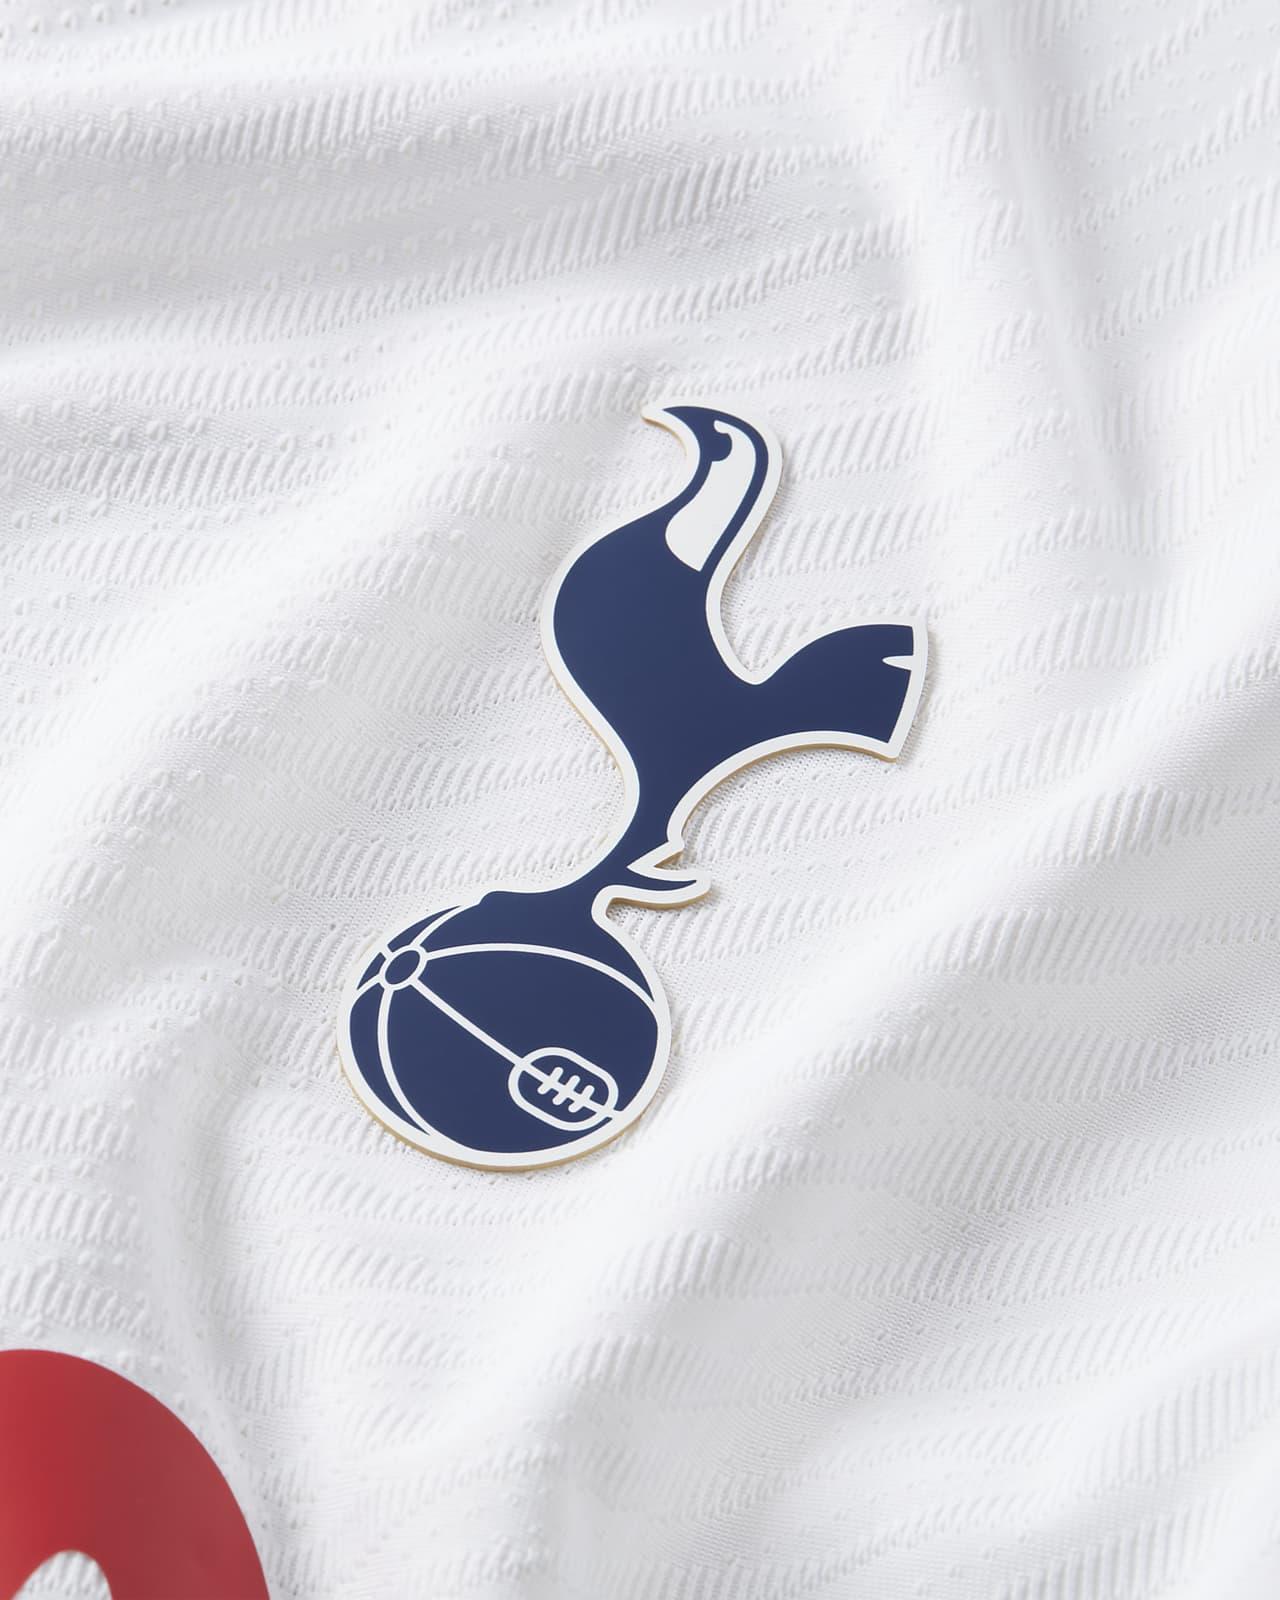 Tottenham Hotspur 2021 22 Nike Home Shirt 21 22 Kits Football Shirt Blog